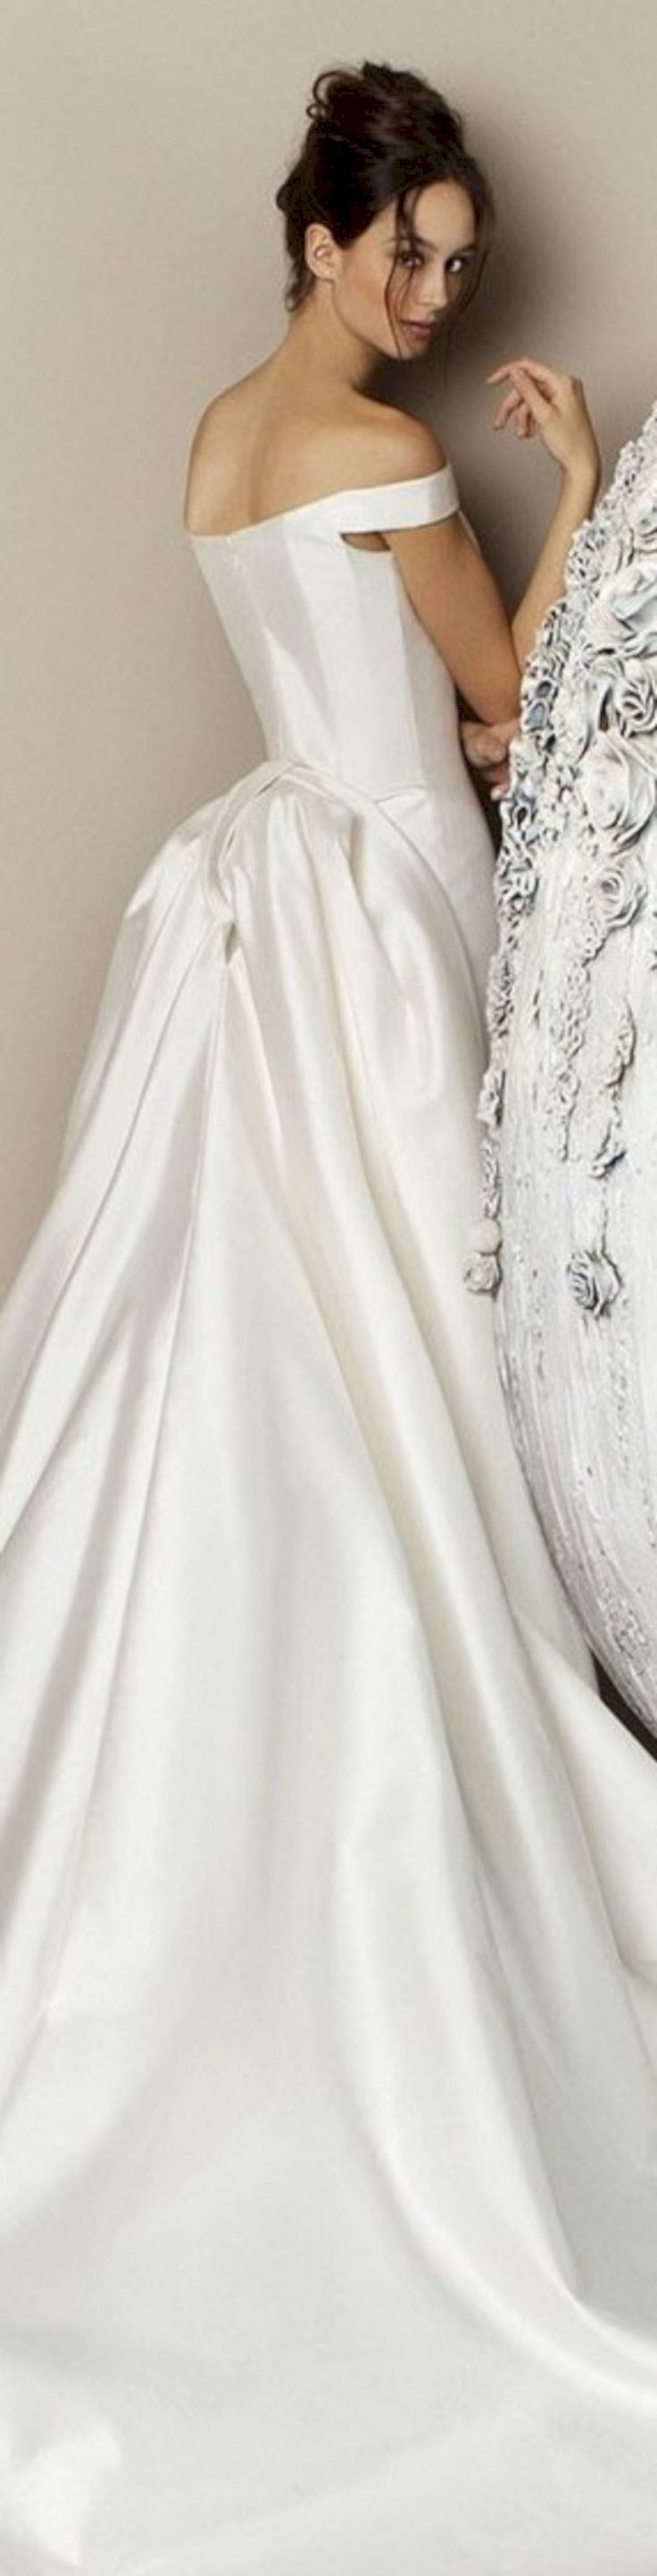 Gloomy 40+ Best Antonio Riva Wedding Dresses Inspirations For Your Wedding Ceremony  https://oosile.com/40-best-antonio-riva-wedding-dresses-inspirations-for-your-wedding-ceremony-9412